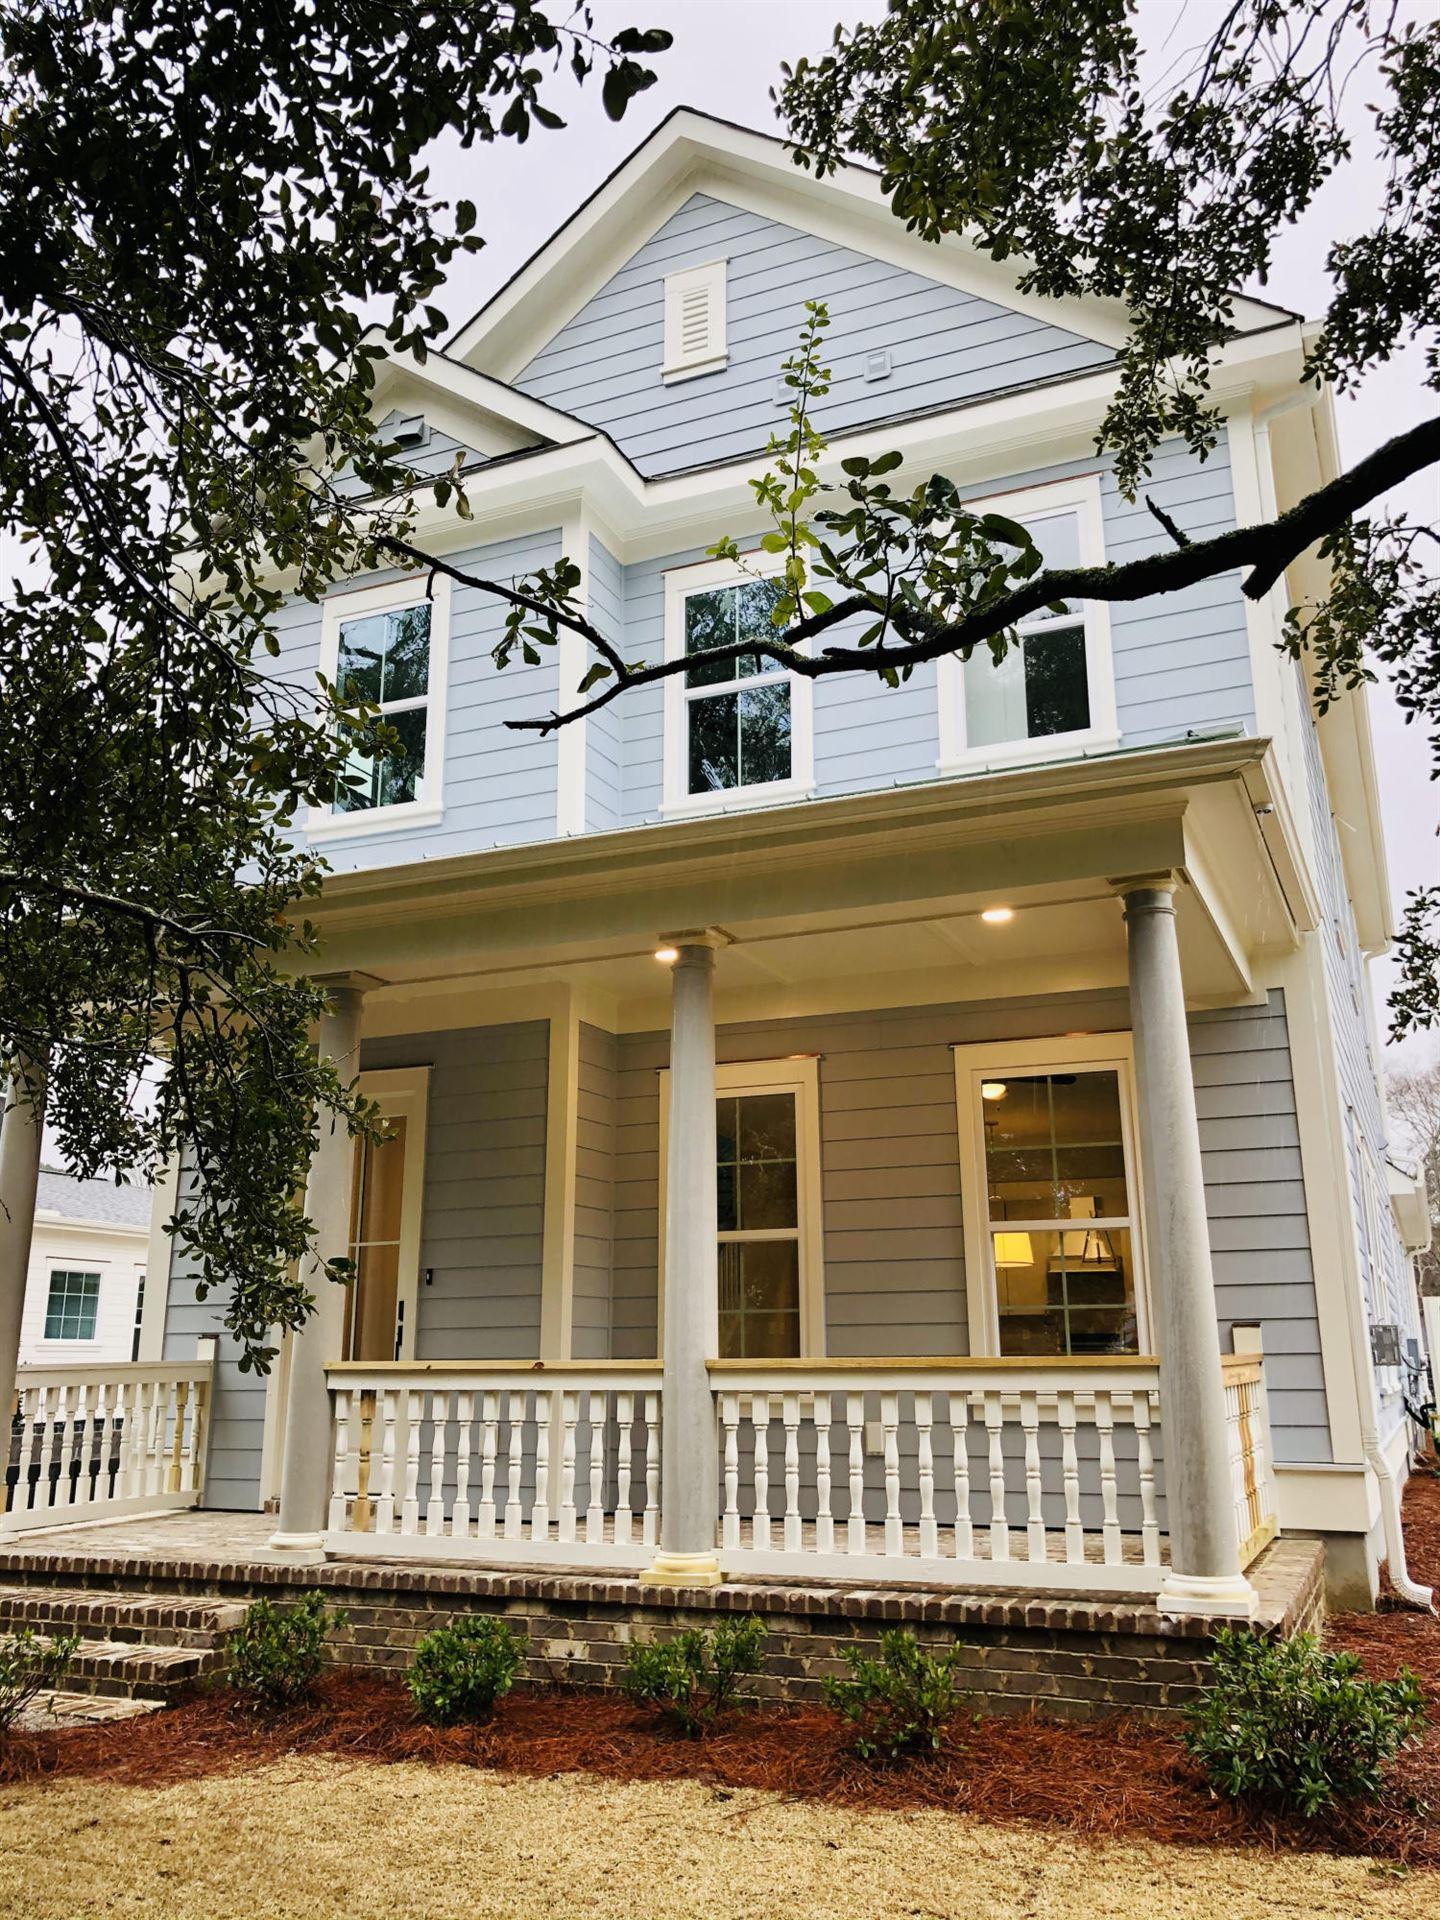 Photo of 1052 Avenue Of Oaks, Charleston, SC 29407 (MLS # 21005350)